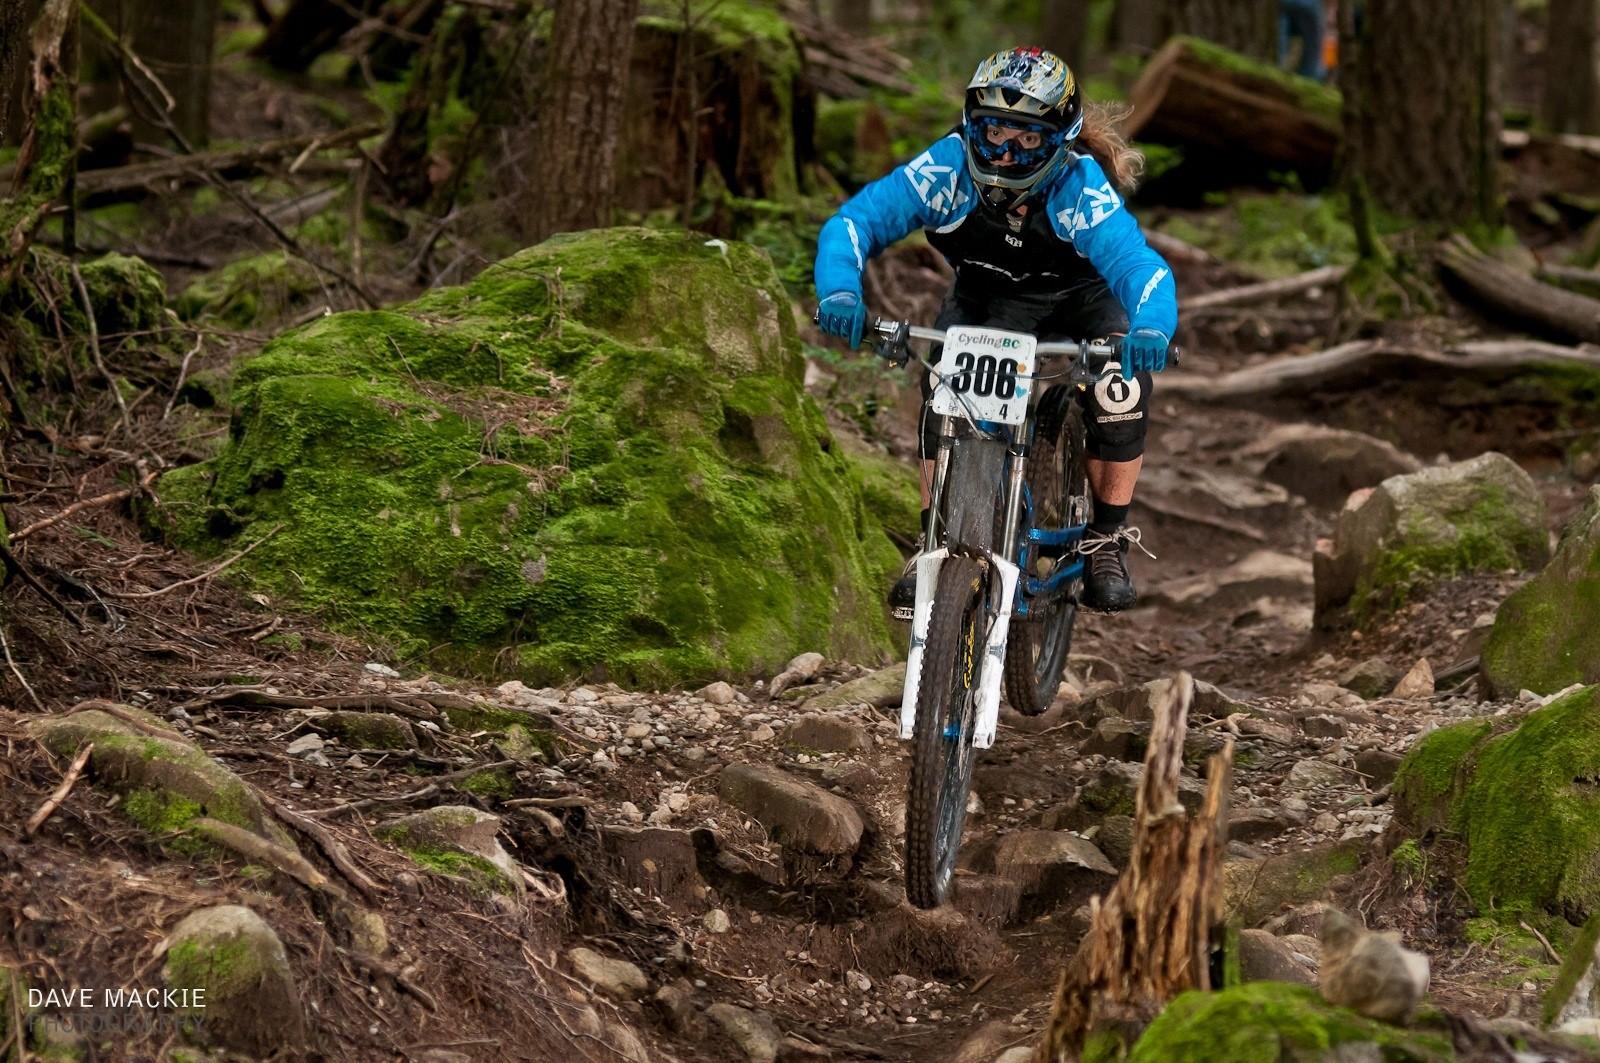 Dirty Jane 7 - sparkplug - Mountain Biking Pictures - Vital MTB